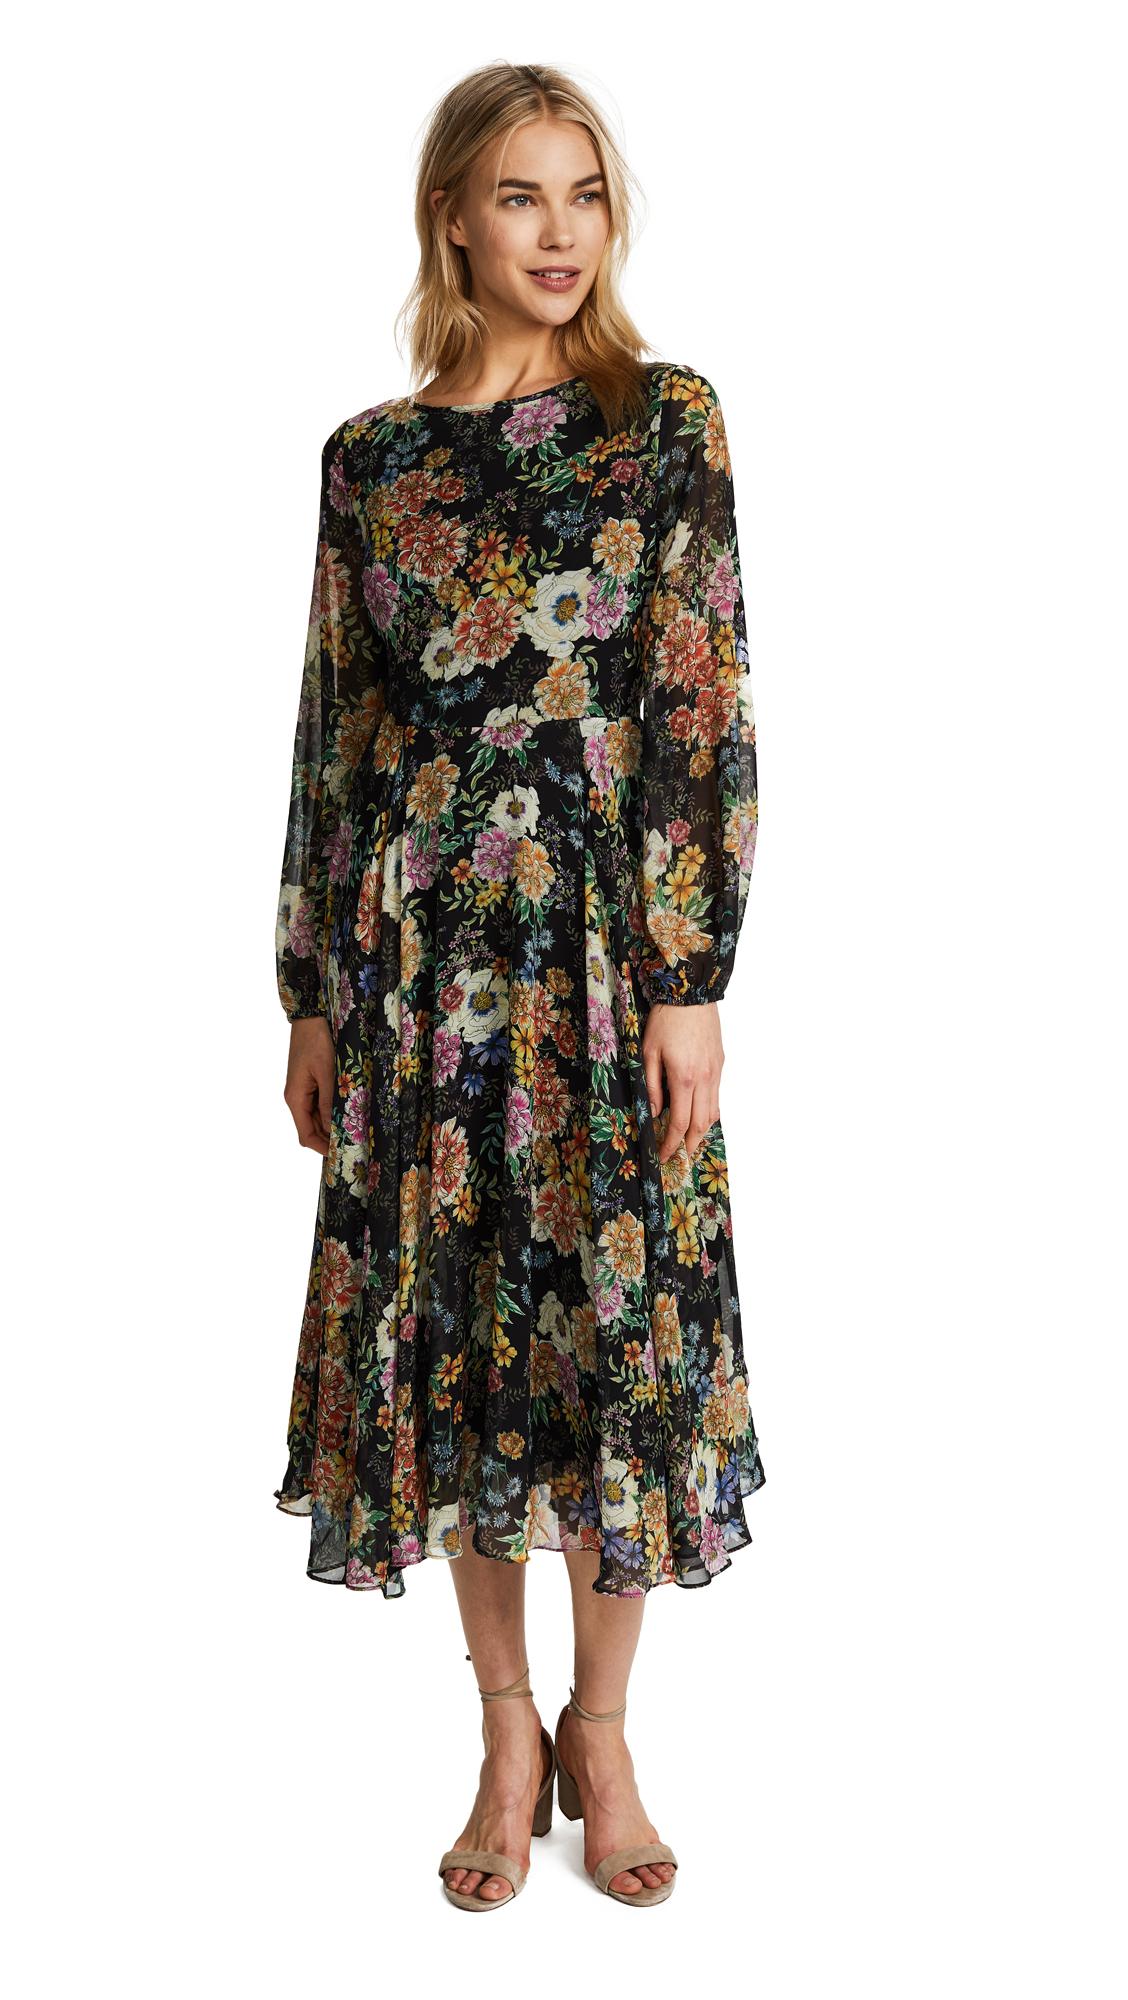 Yumi Kim Serenade Dress - Wisteria Park